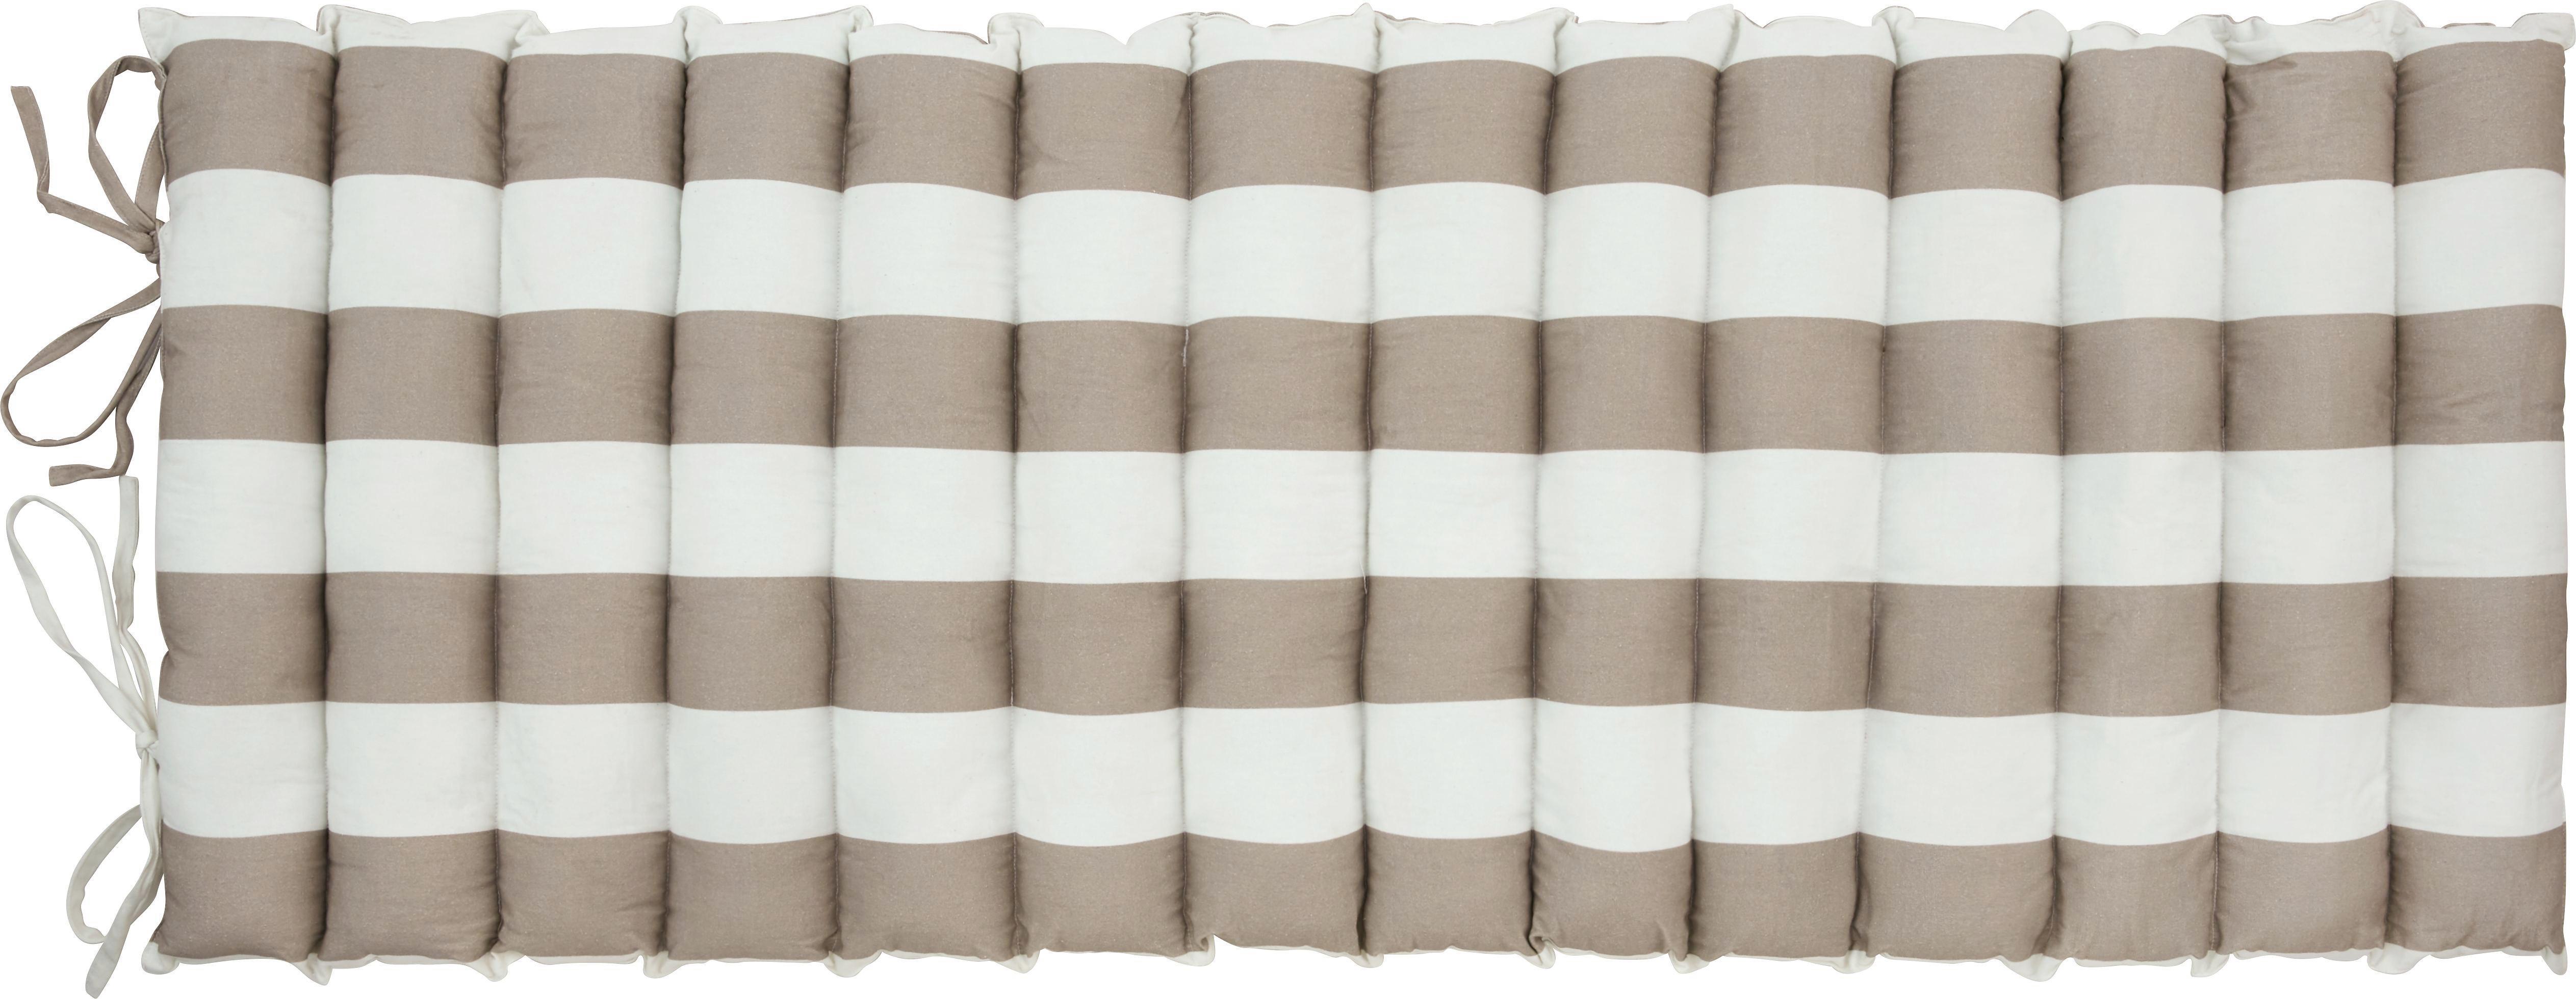 Strandmatte Uni in Türkis, ca. 60x180cm - Weiß/Grau, Textil (60/180cm) - MÖMAX modern living